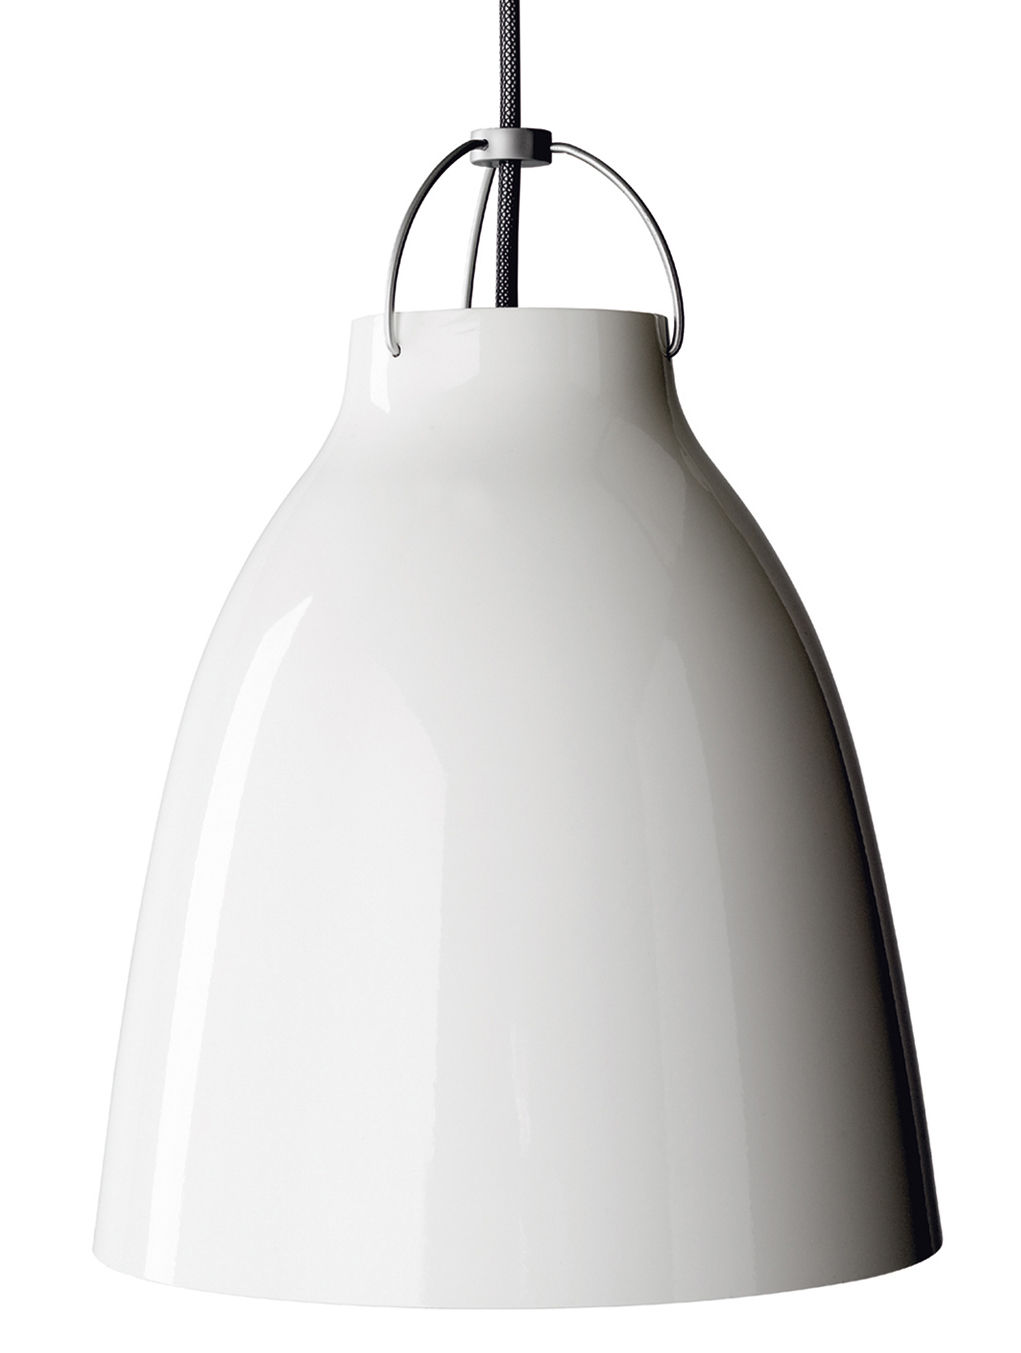 Lighting - Pendant Lighting - Caravaggio XS Pendant by Lightyears - White - Ø 11 cm - Lacquered aluminium